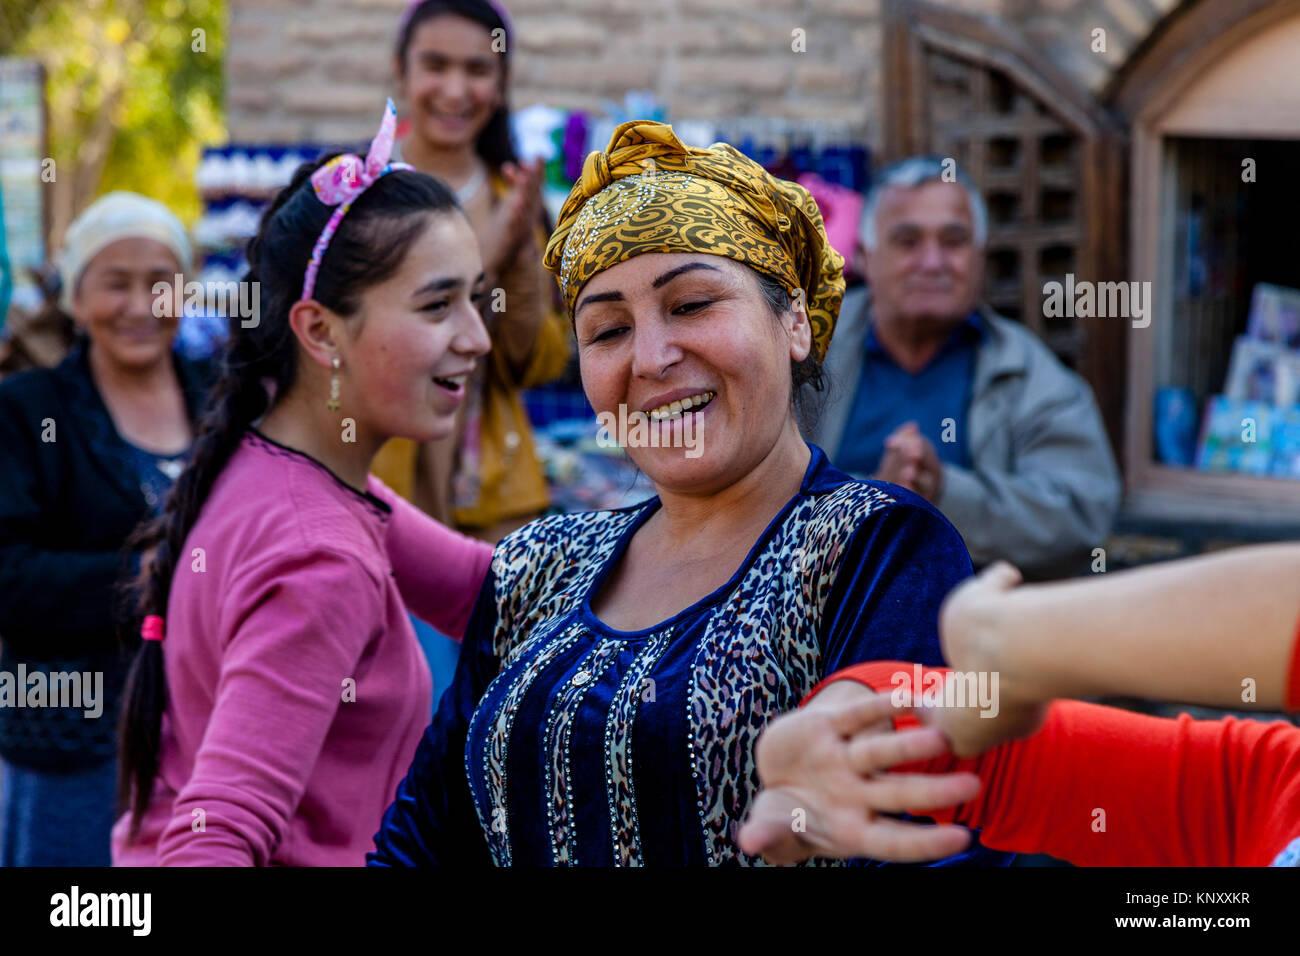 Uzbek Women Dancing In The Street, Khiva, Uzbekistan Stock Photo